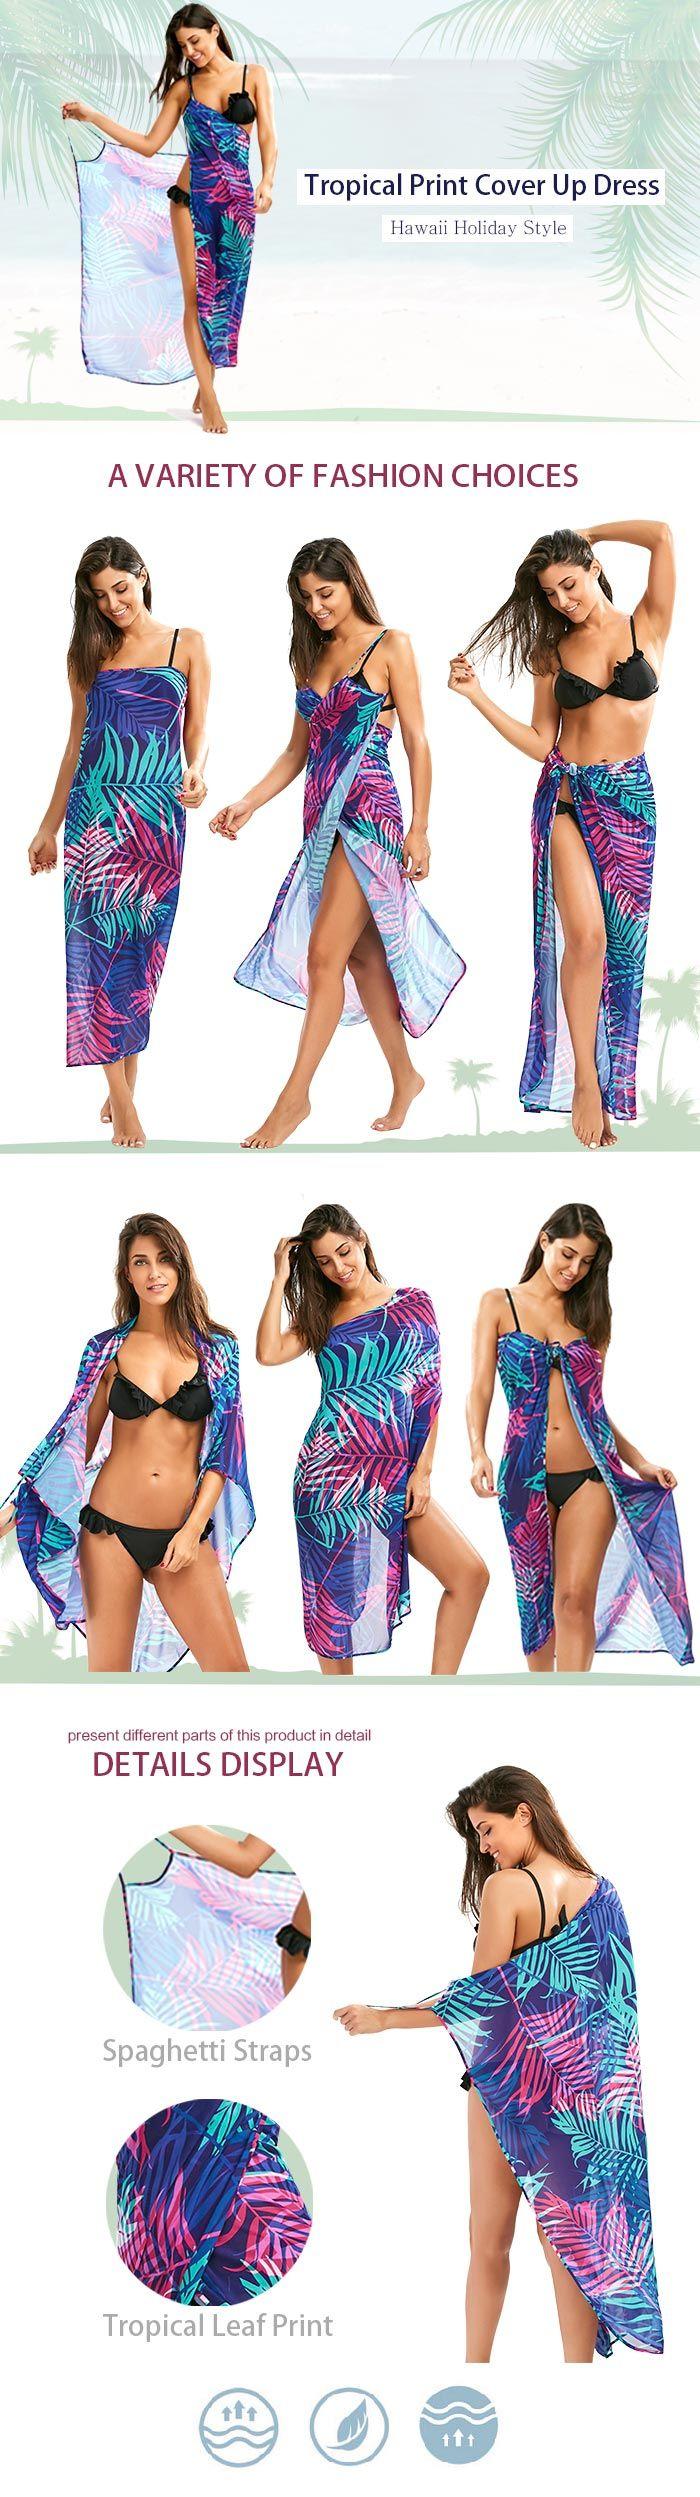 Tropical Leaf Cover Up Slip Dress